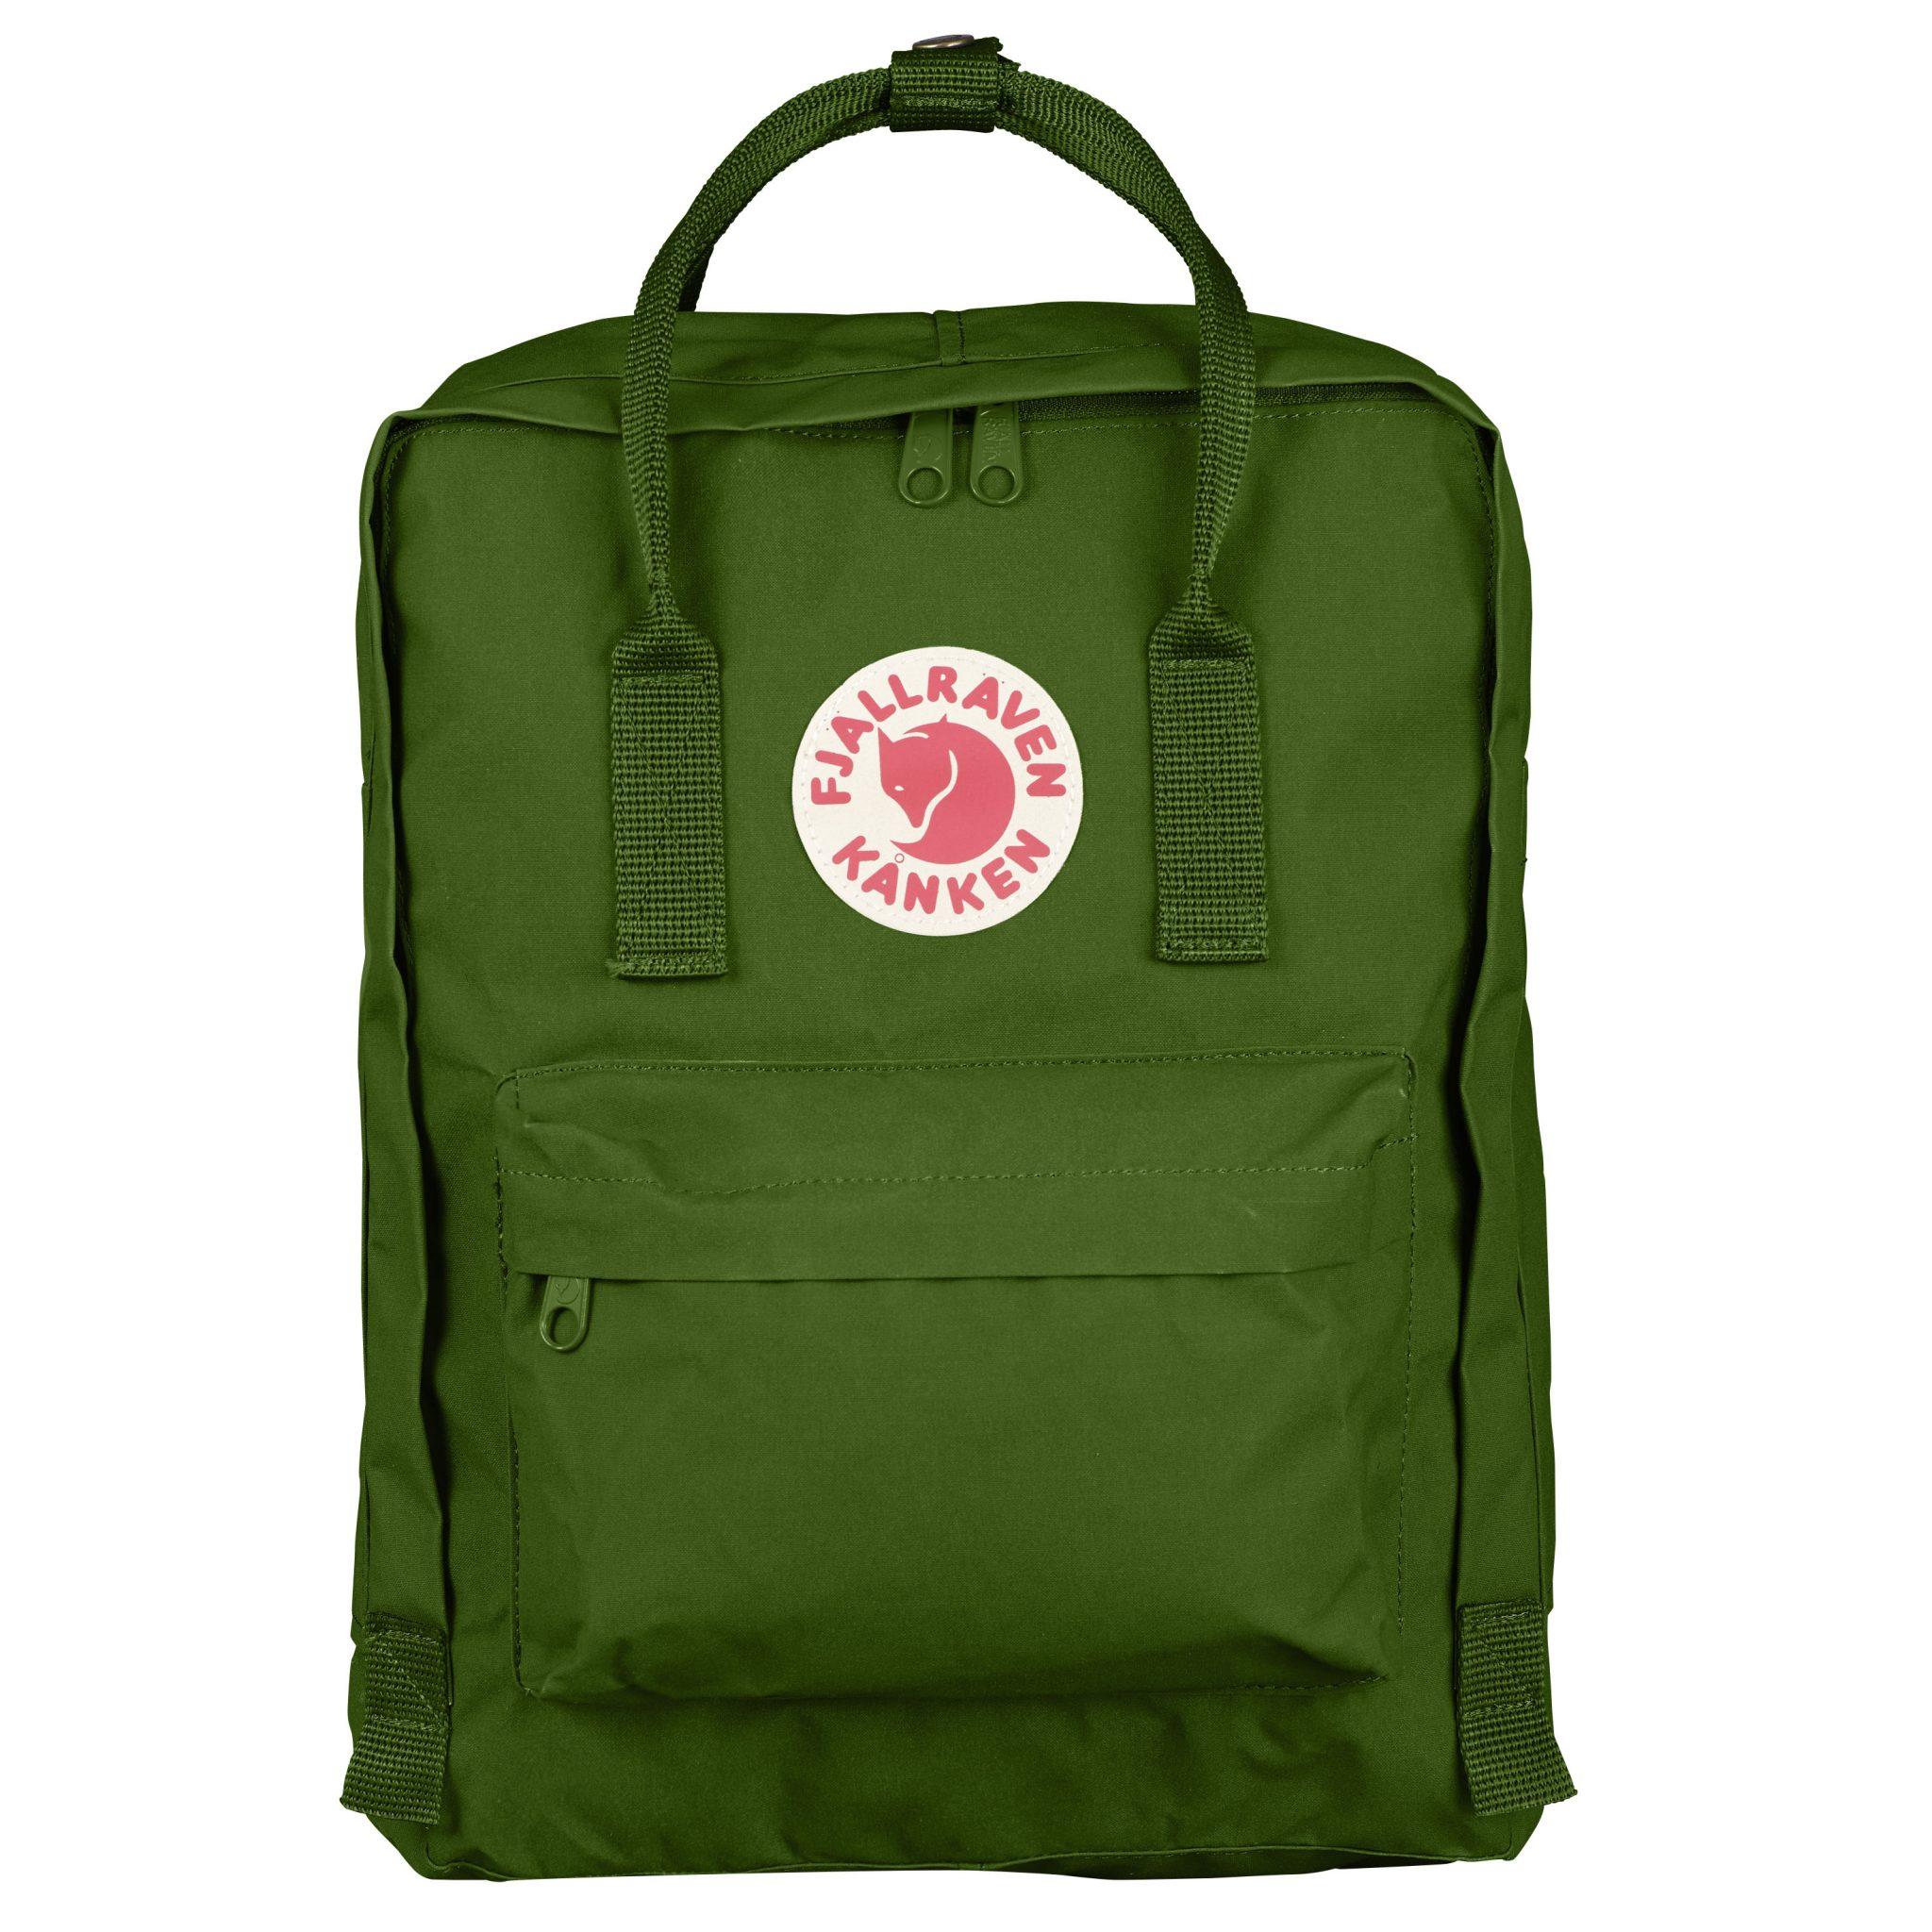 Fjällräven Kånken Backpack | Leaf Green